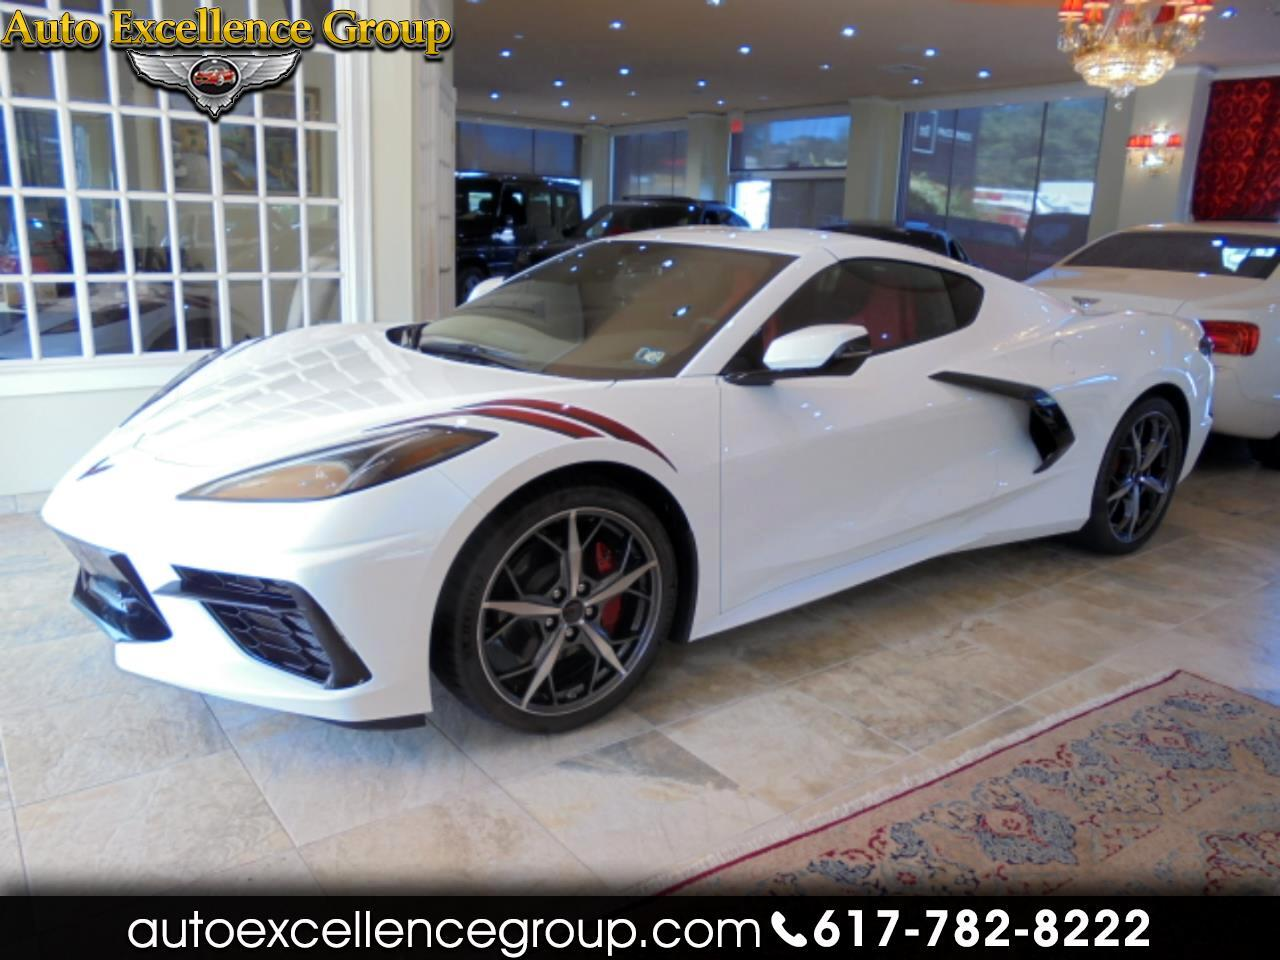 Chevrolet Corvette 1LT Coupe 2020